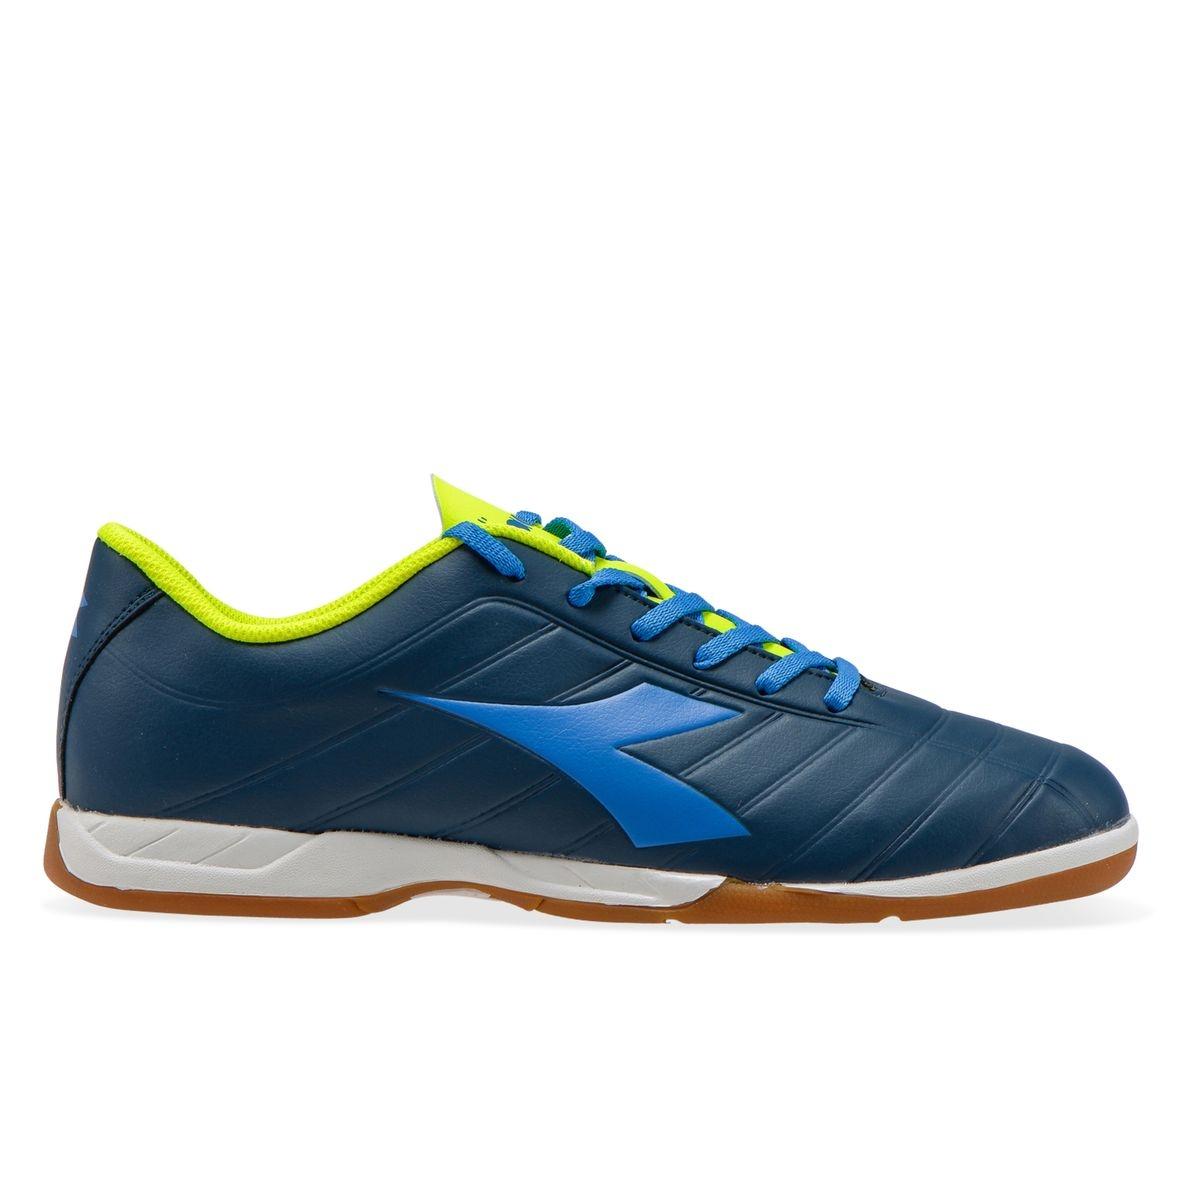 Chaussure de football PICHICHI